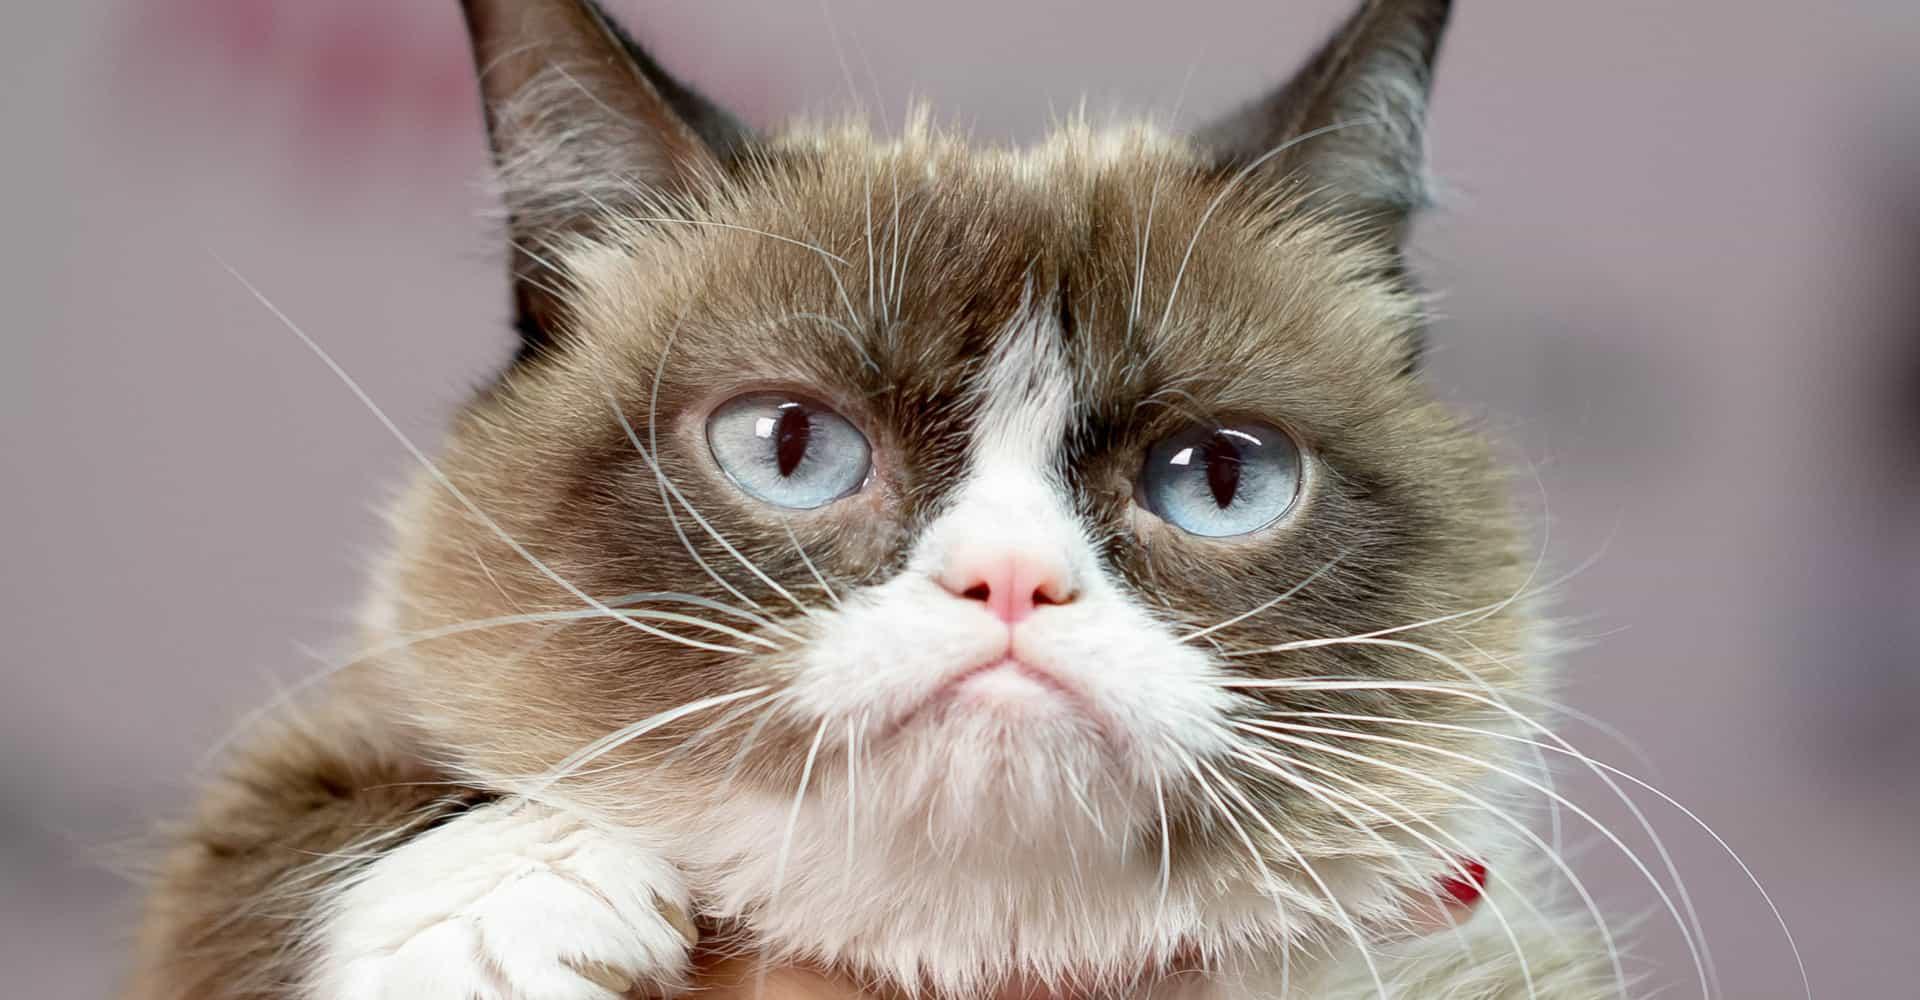 animais fantásticos grumpy cat